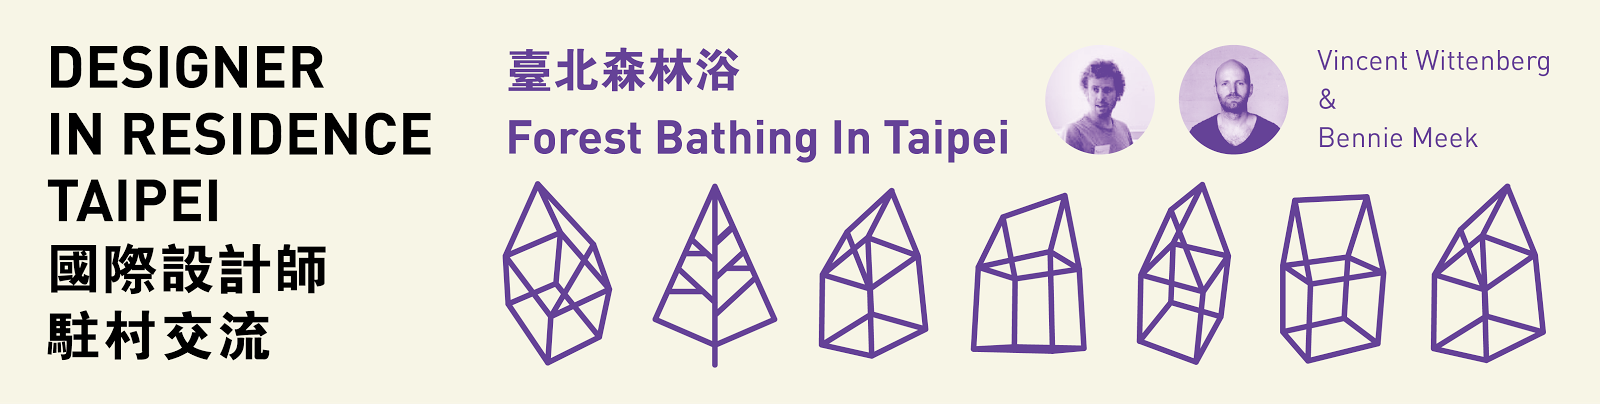 World Design Capital Taipei 2016 Designers in Residence Taipei Workshop